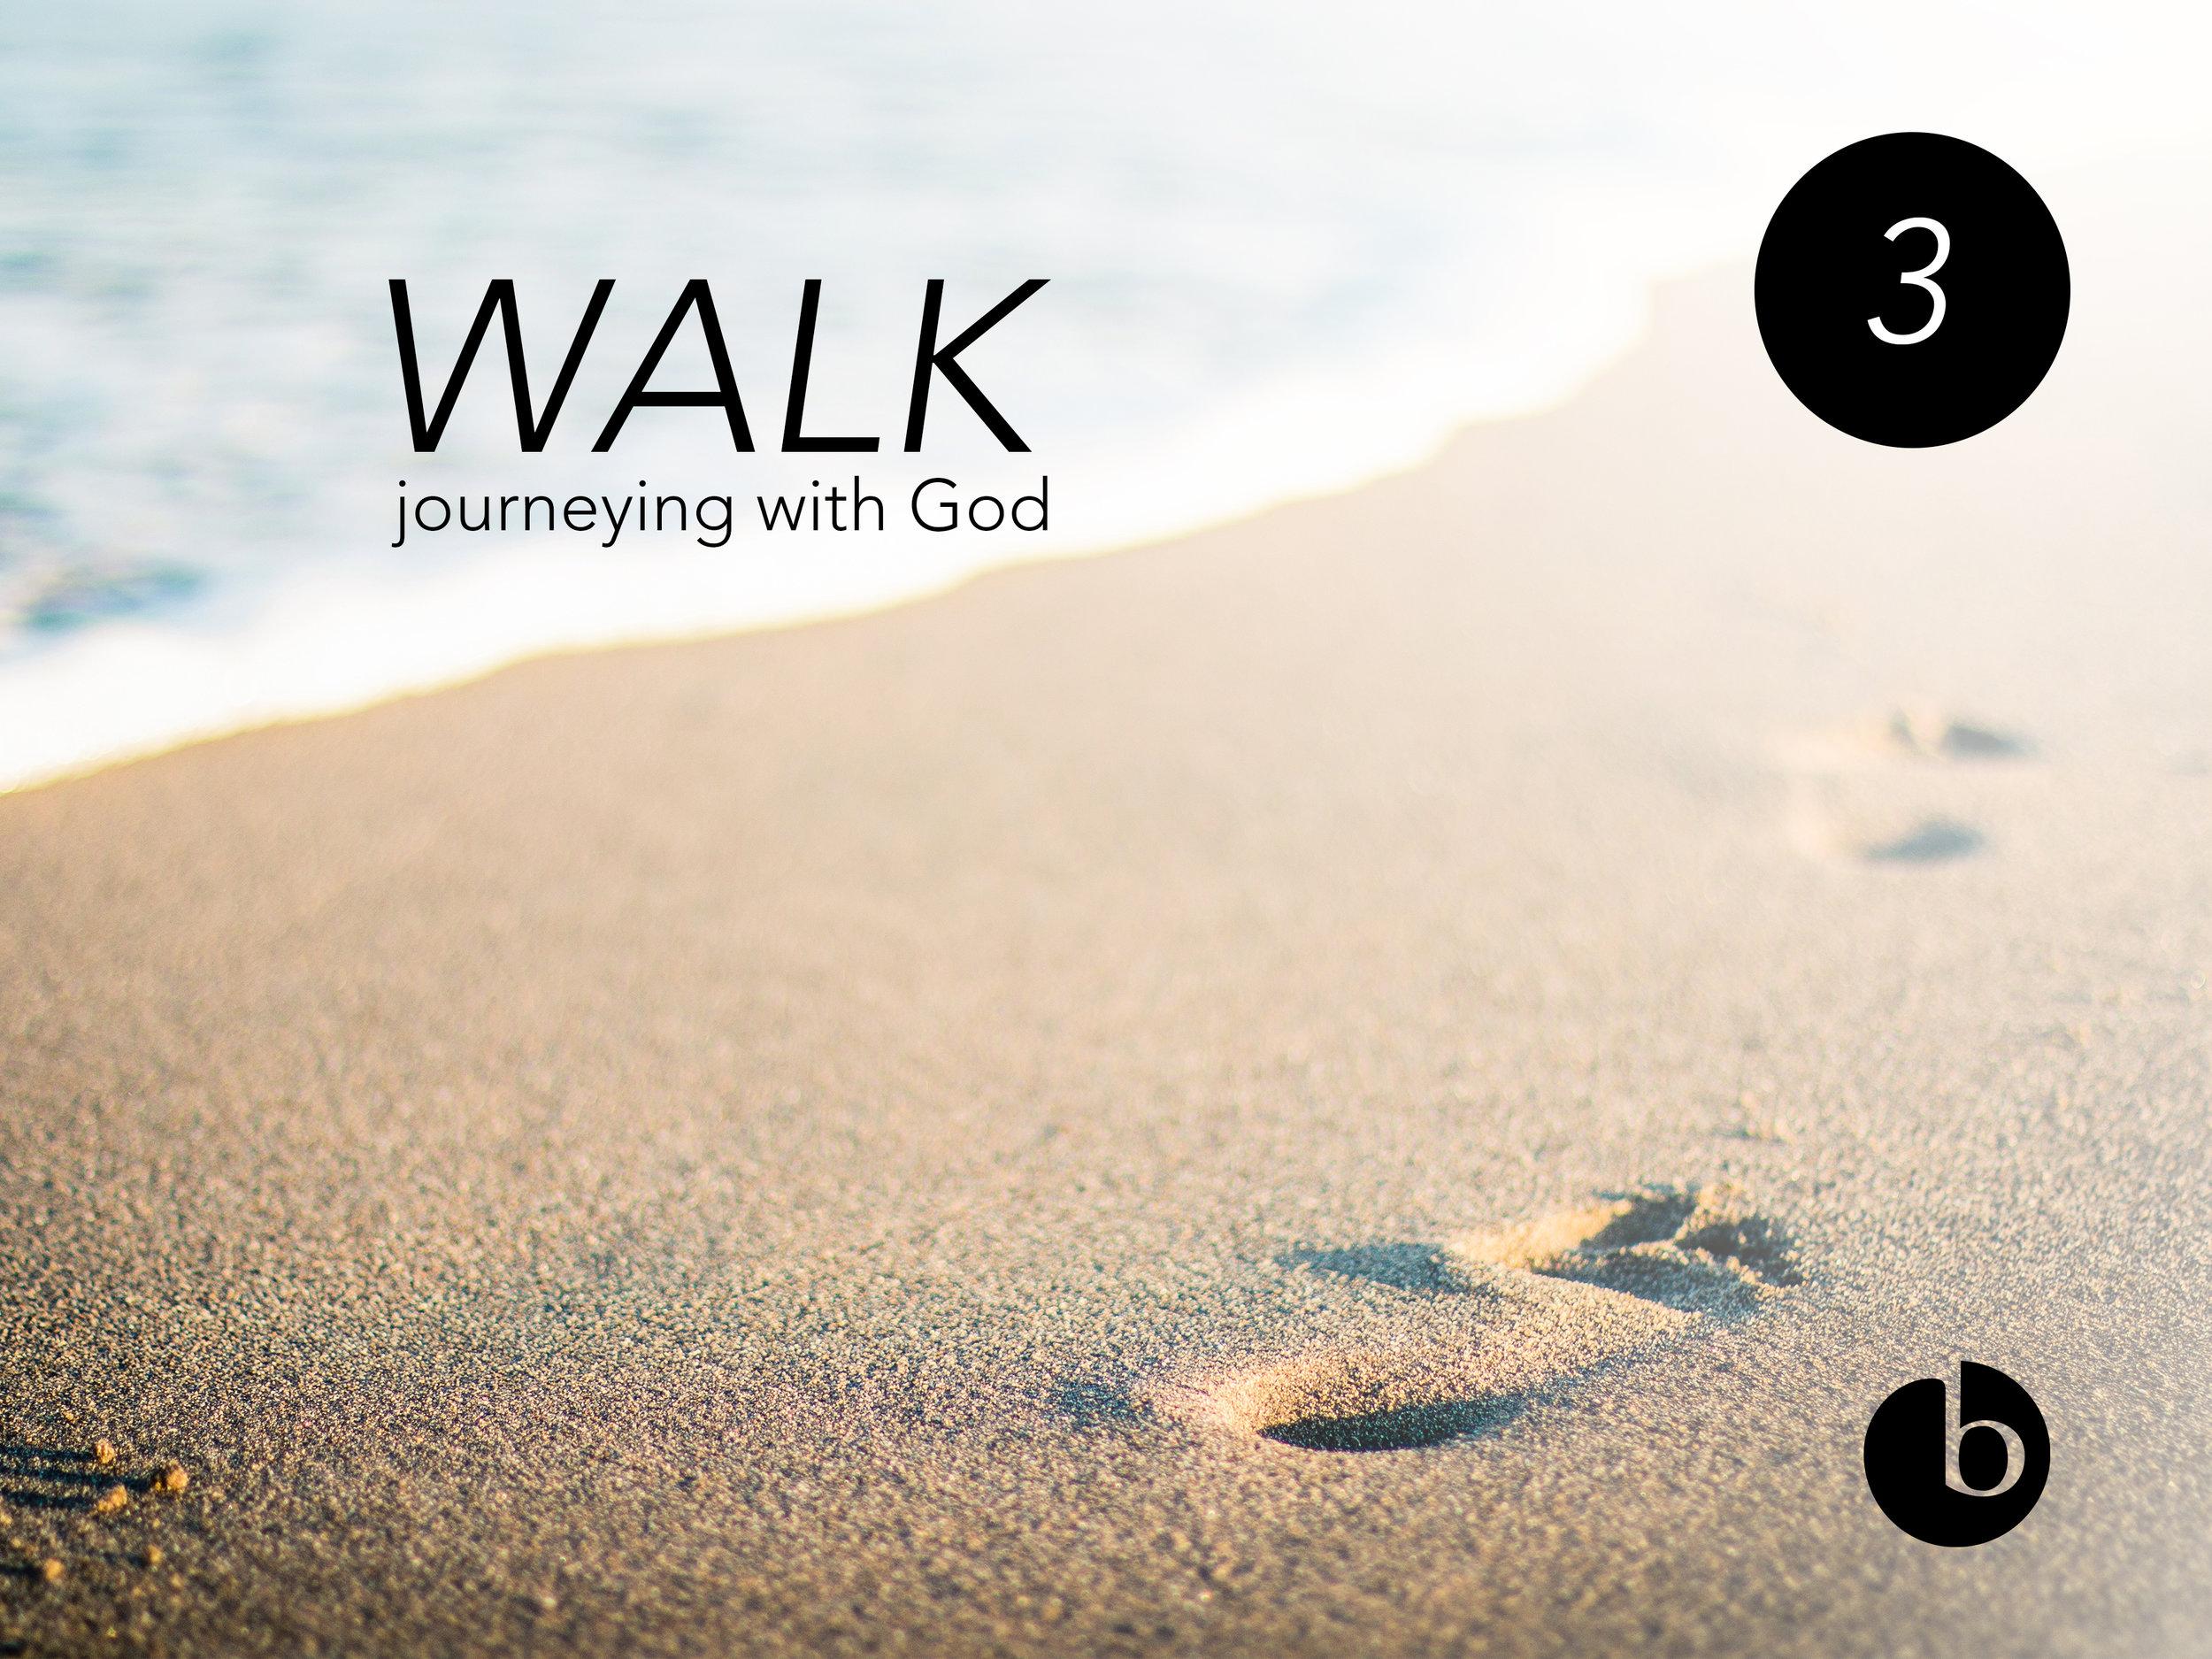 Walk thumbnail 3.jpg